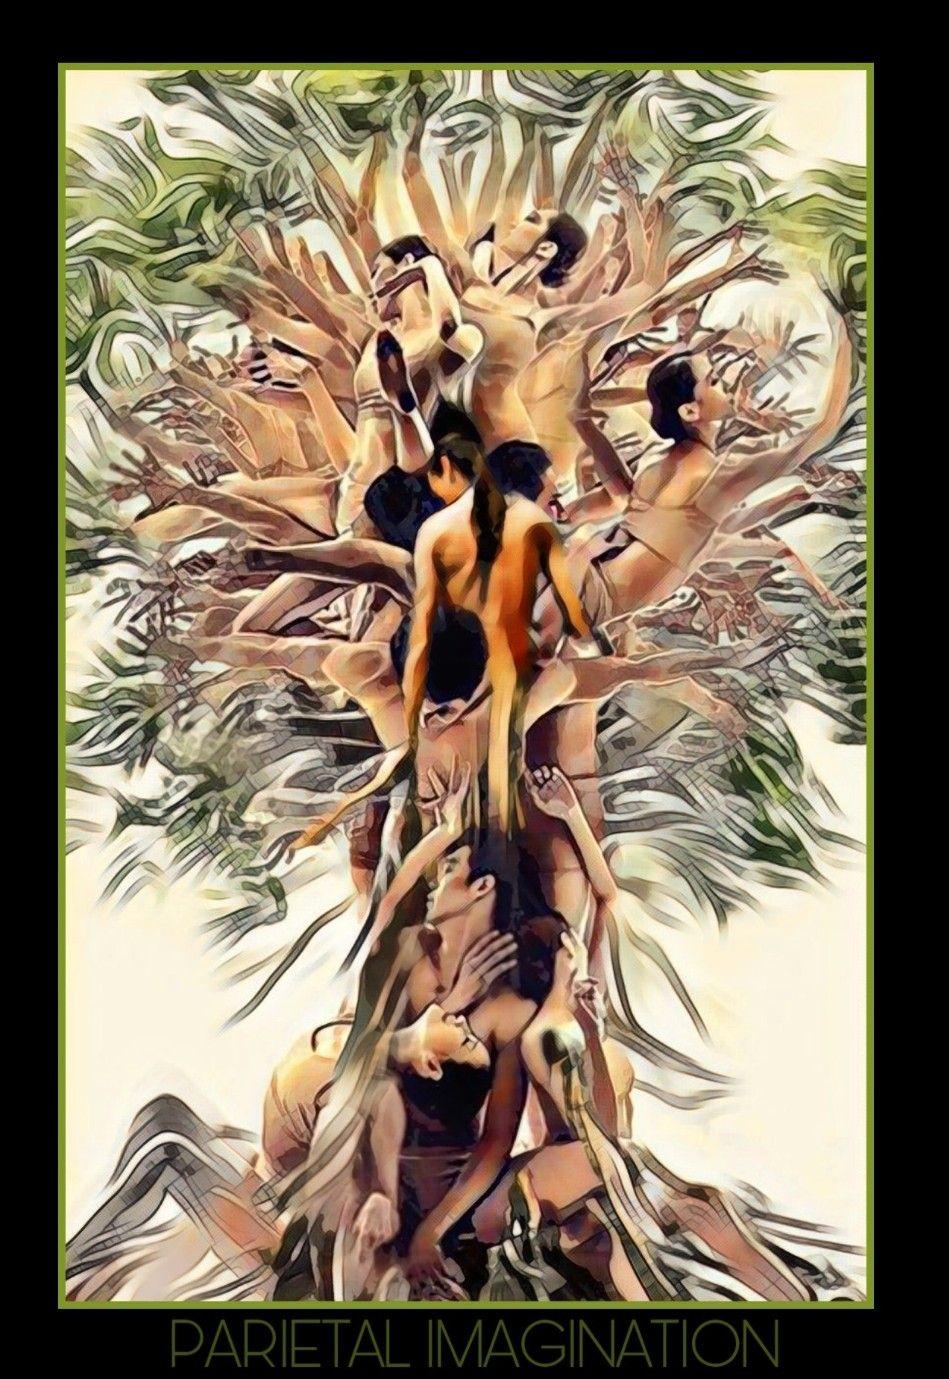 Tree of Life (FEATURED) SONG LINK: https://youtu.be/aDeNQNtW1f8 Edit by: Parietal Imagination Art  @pa, A. Apoly Bal Remix #humanbody #tree #treeoflife #surrealism #branches #vines #magicfx #artisticfx #hue #drawtool #vip #madewithpicsart #parietalimagination #notfreetoedit